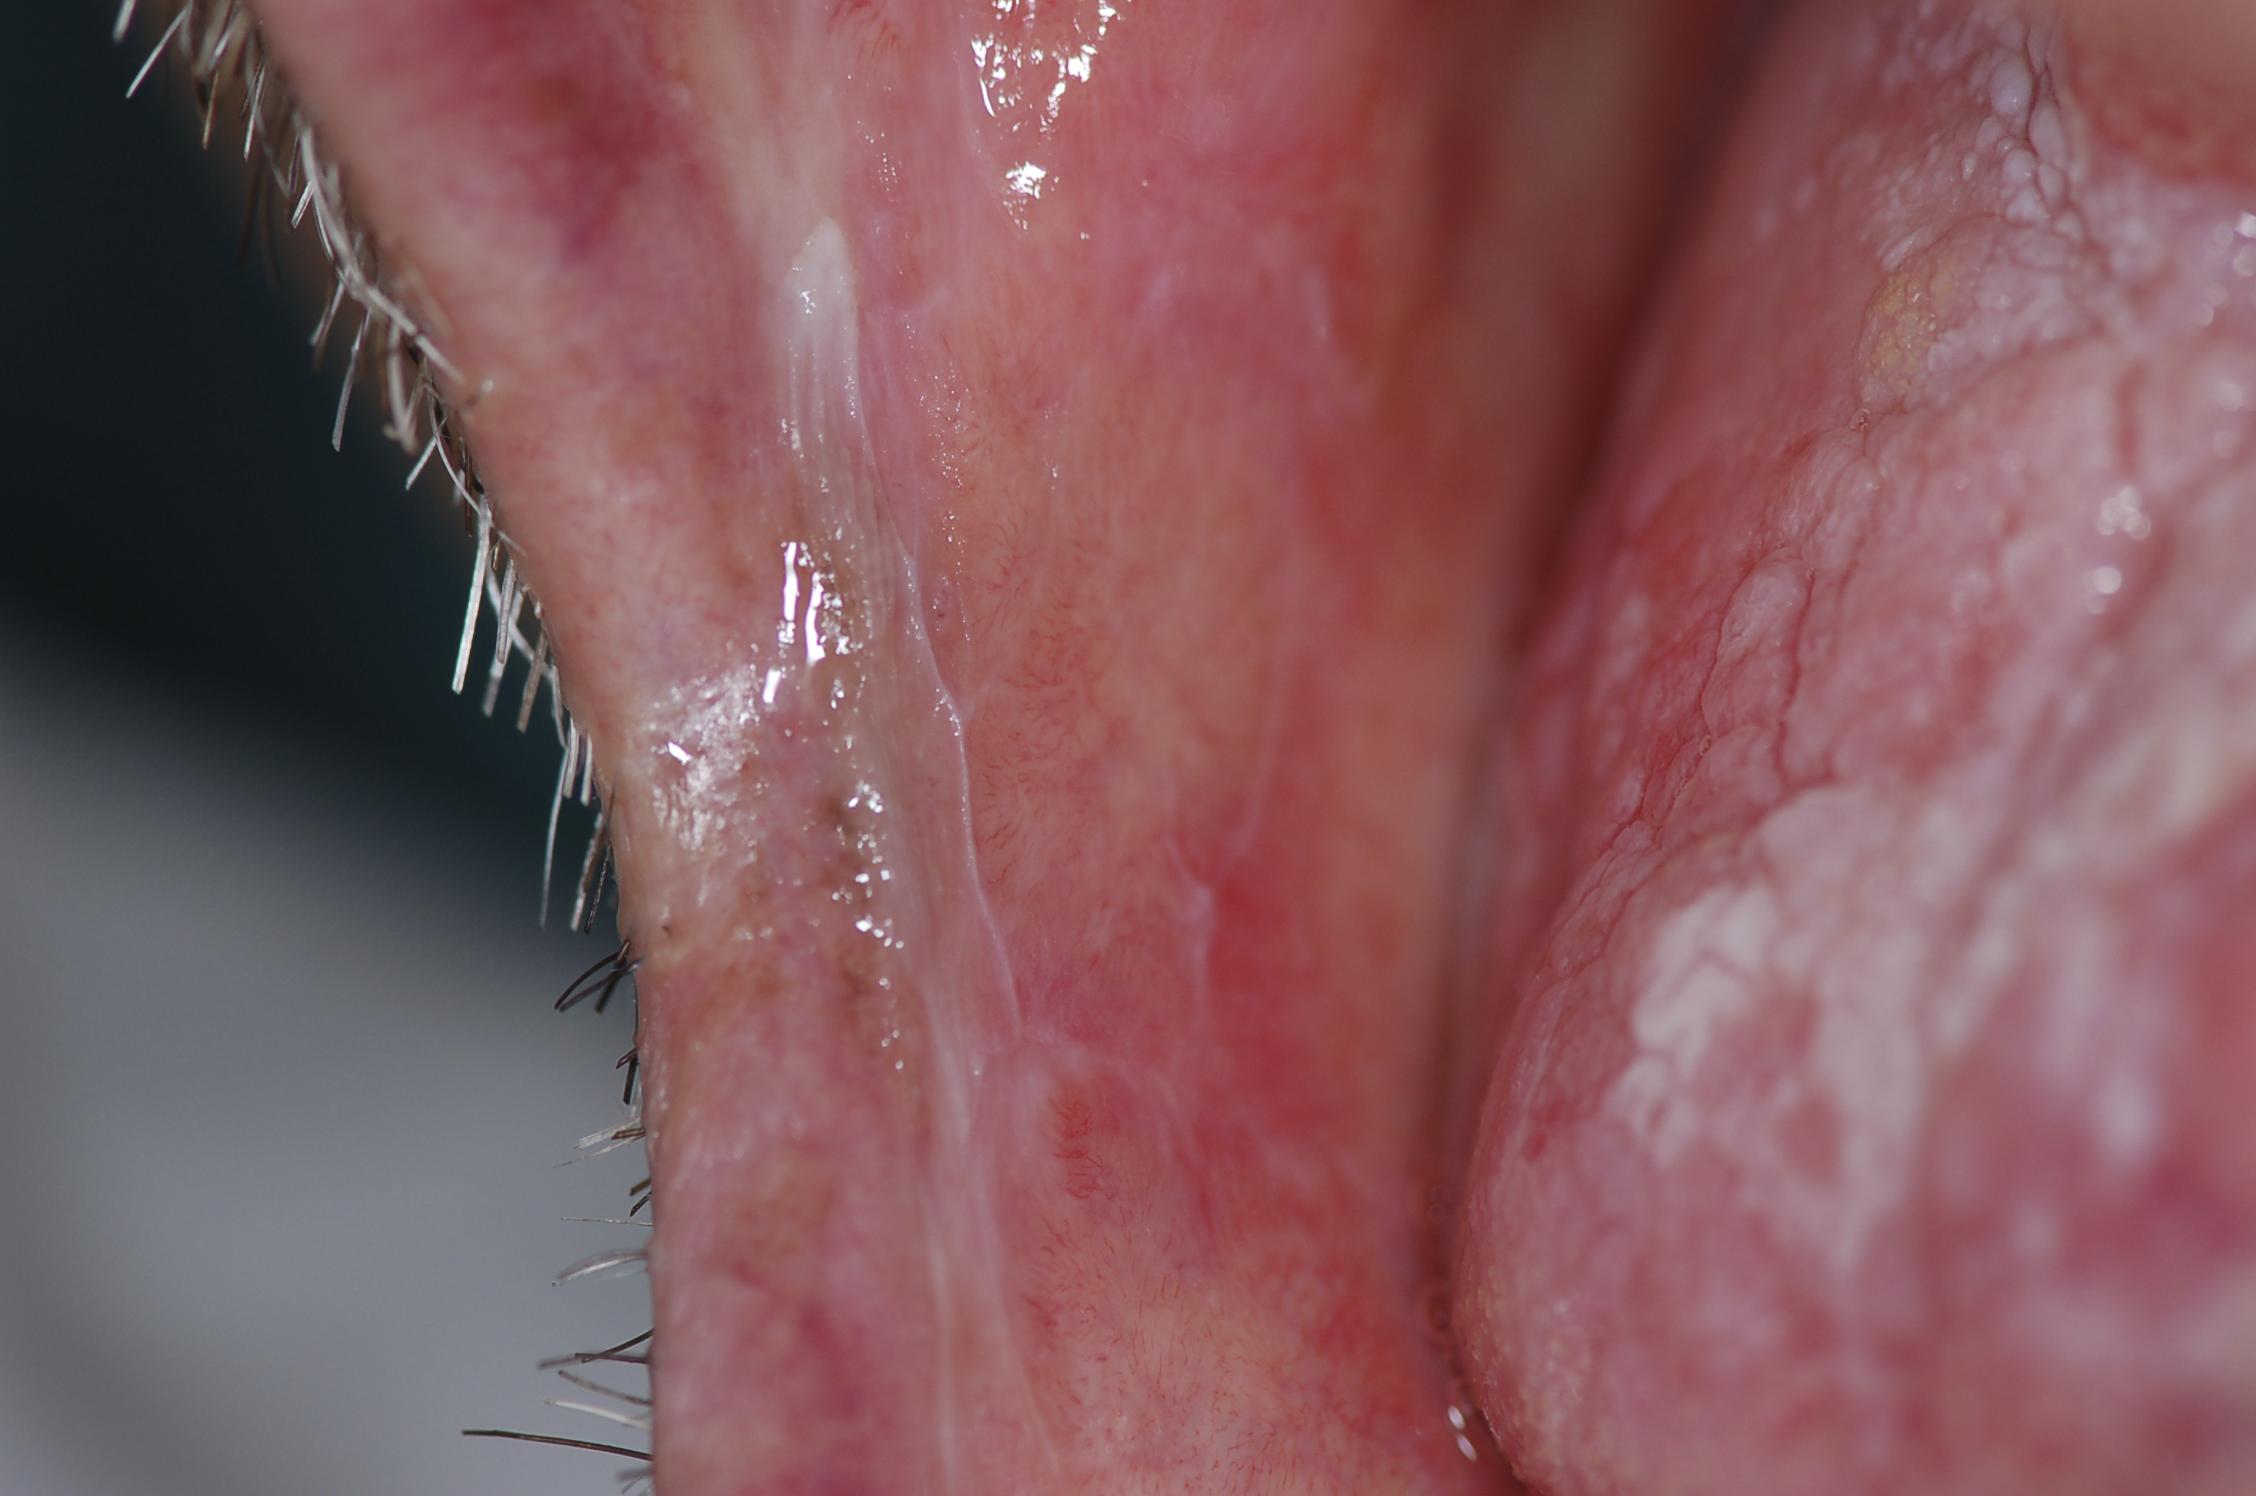 Interlacing White Striae on the Right Buccal Mucosa, Consistent with the Diagnosis of Oral Lichen Planus